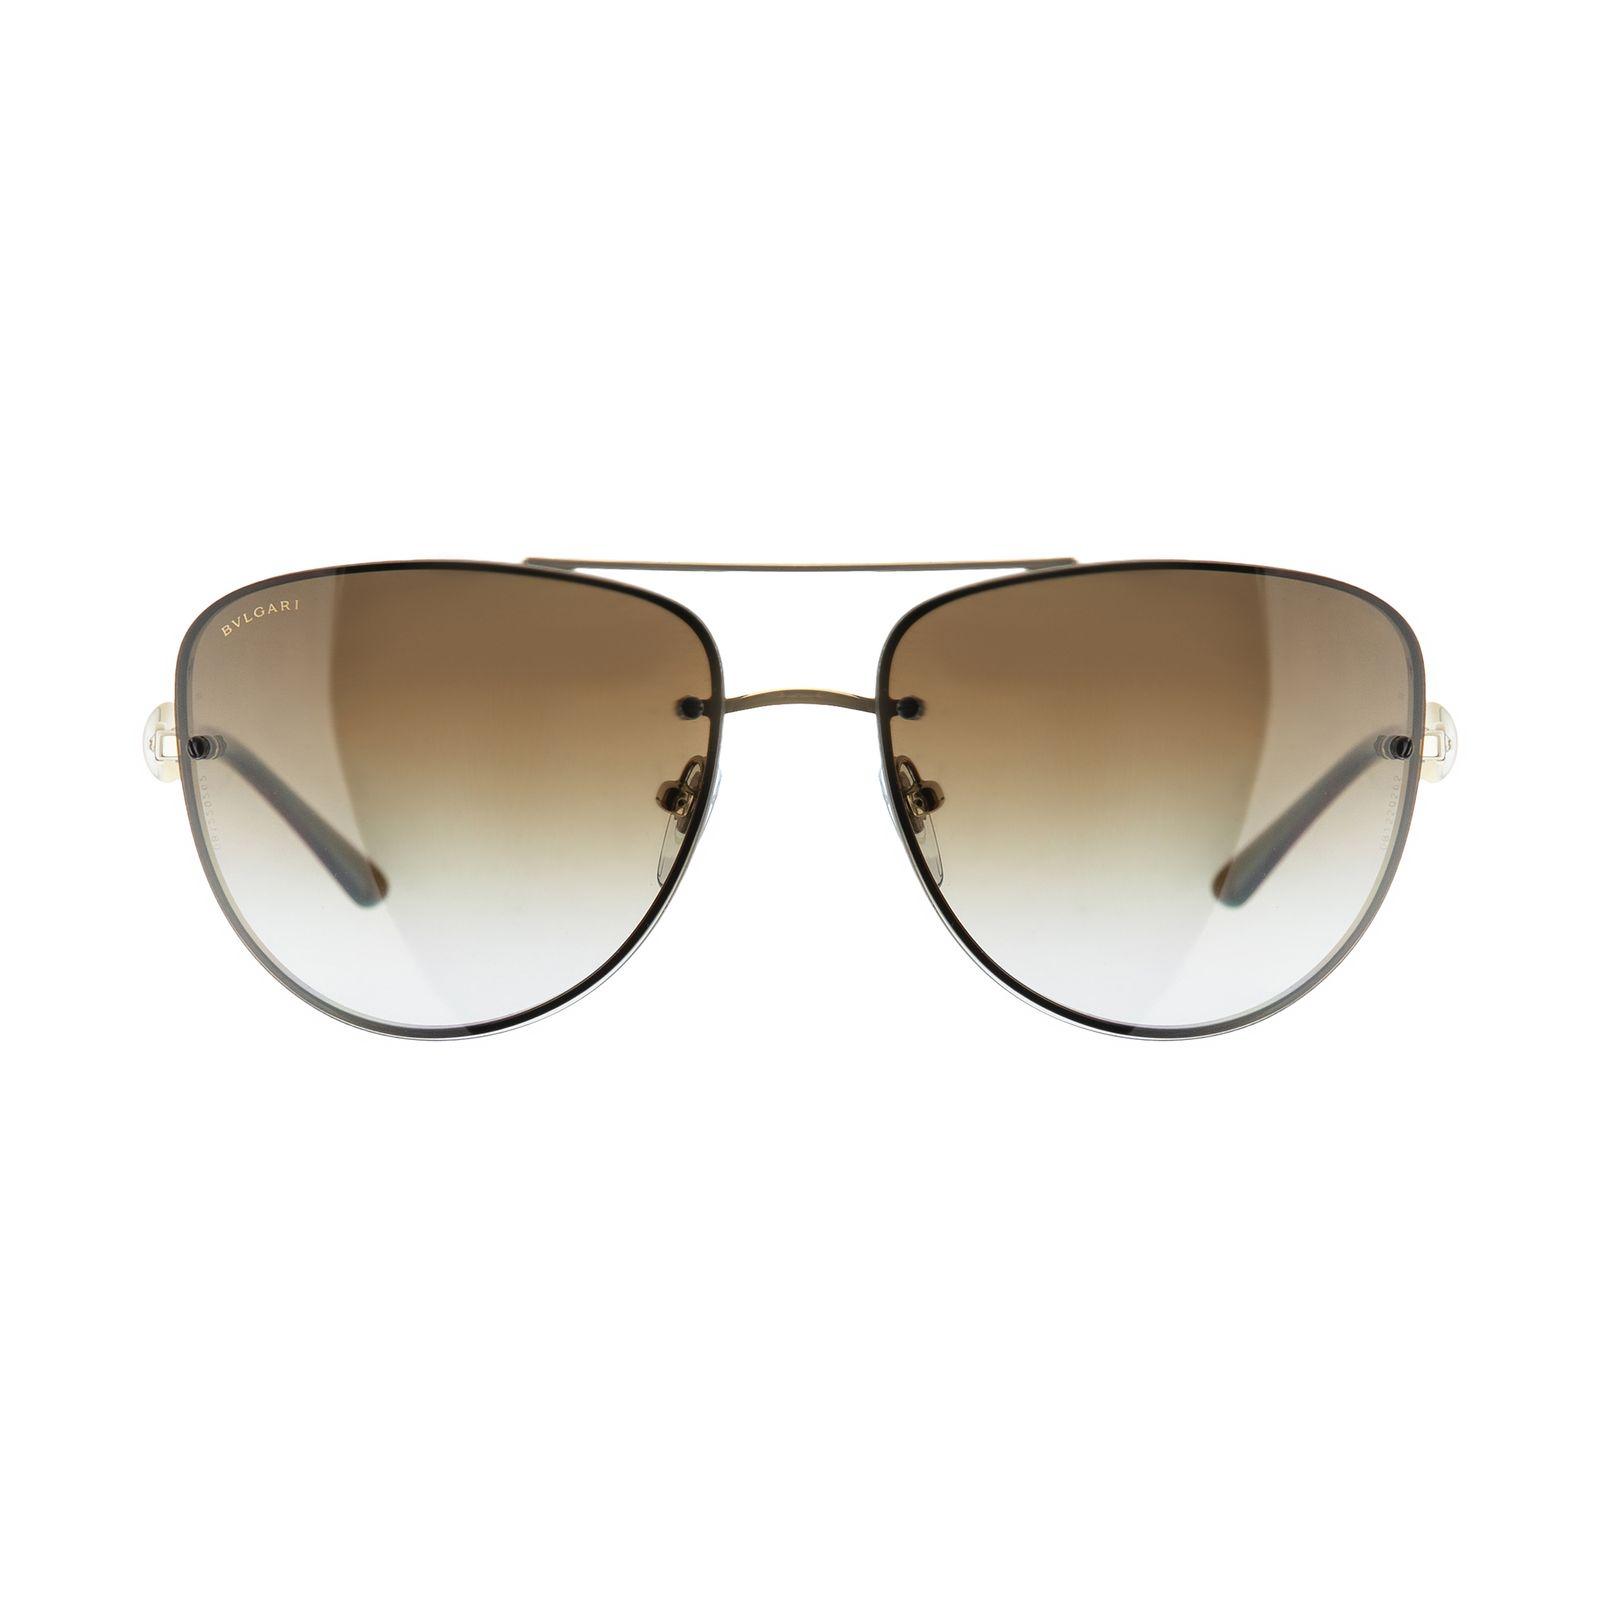 عینک آفتابی مردانه بولگاری مدل BV6086B 0278T5 -  - 2